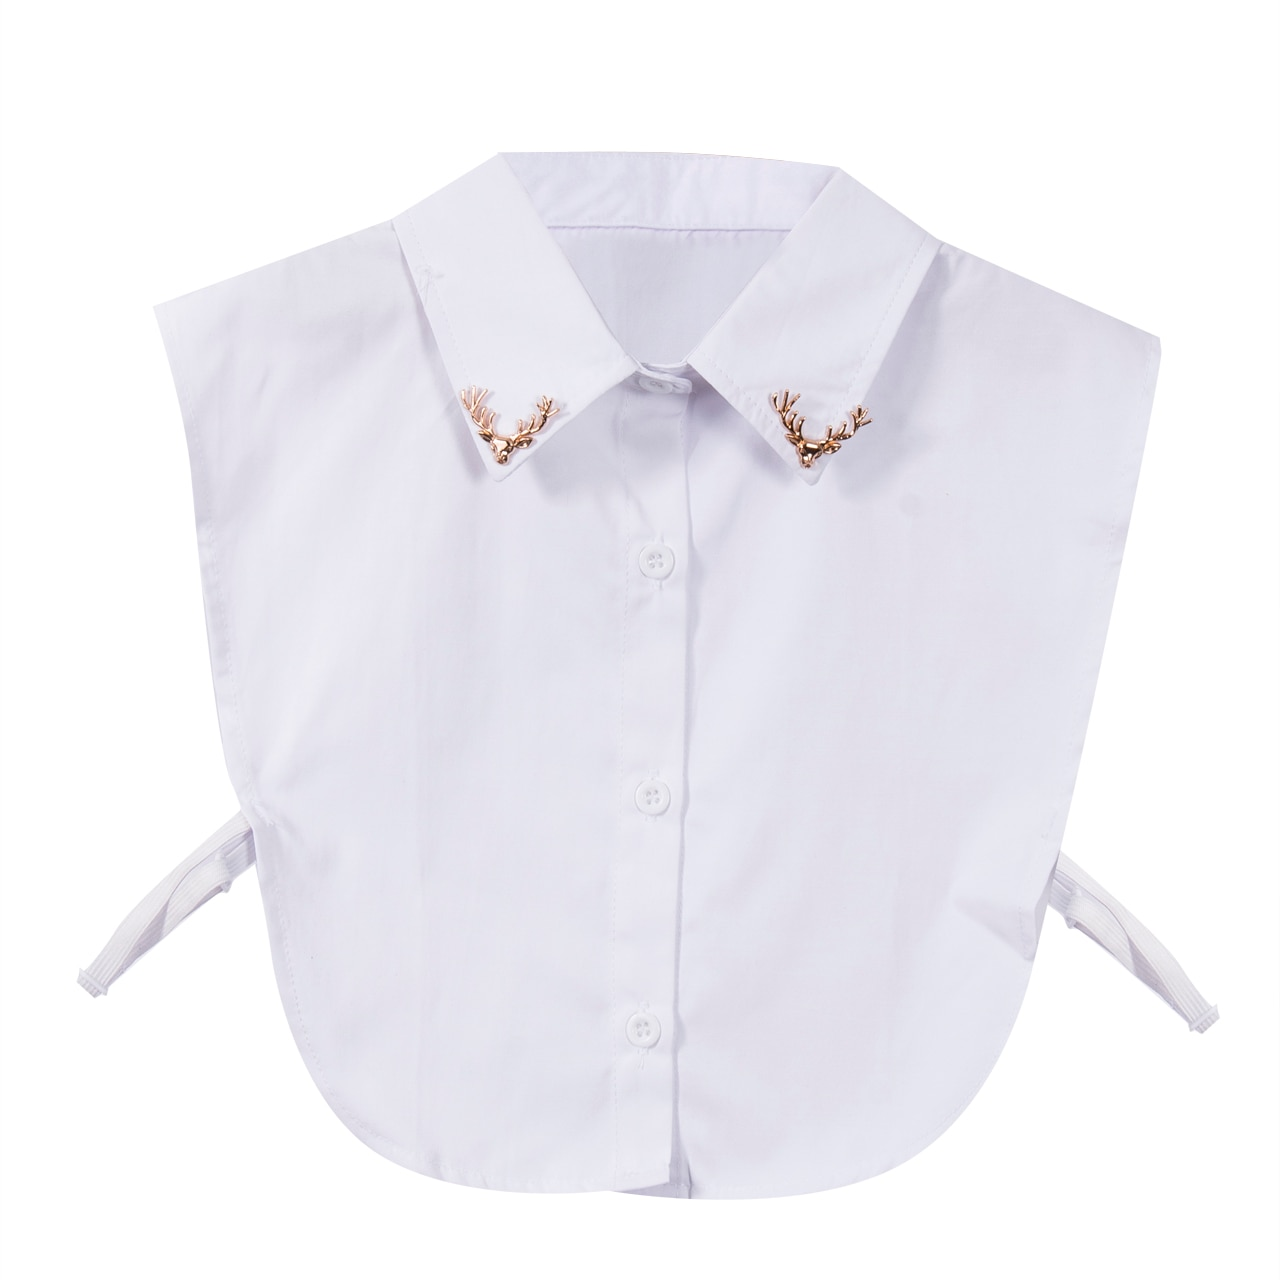 Nuevo Collar falso de ciervo adornado babero desmontable falso media solapa camisa Collar blusa cuello